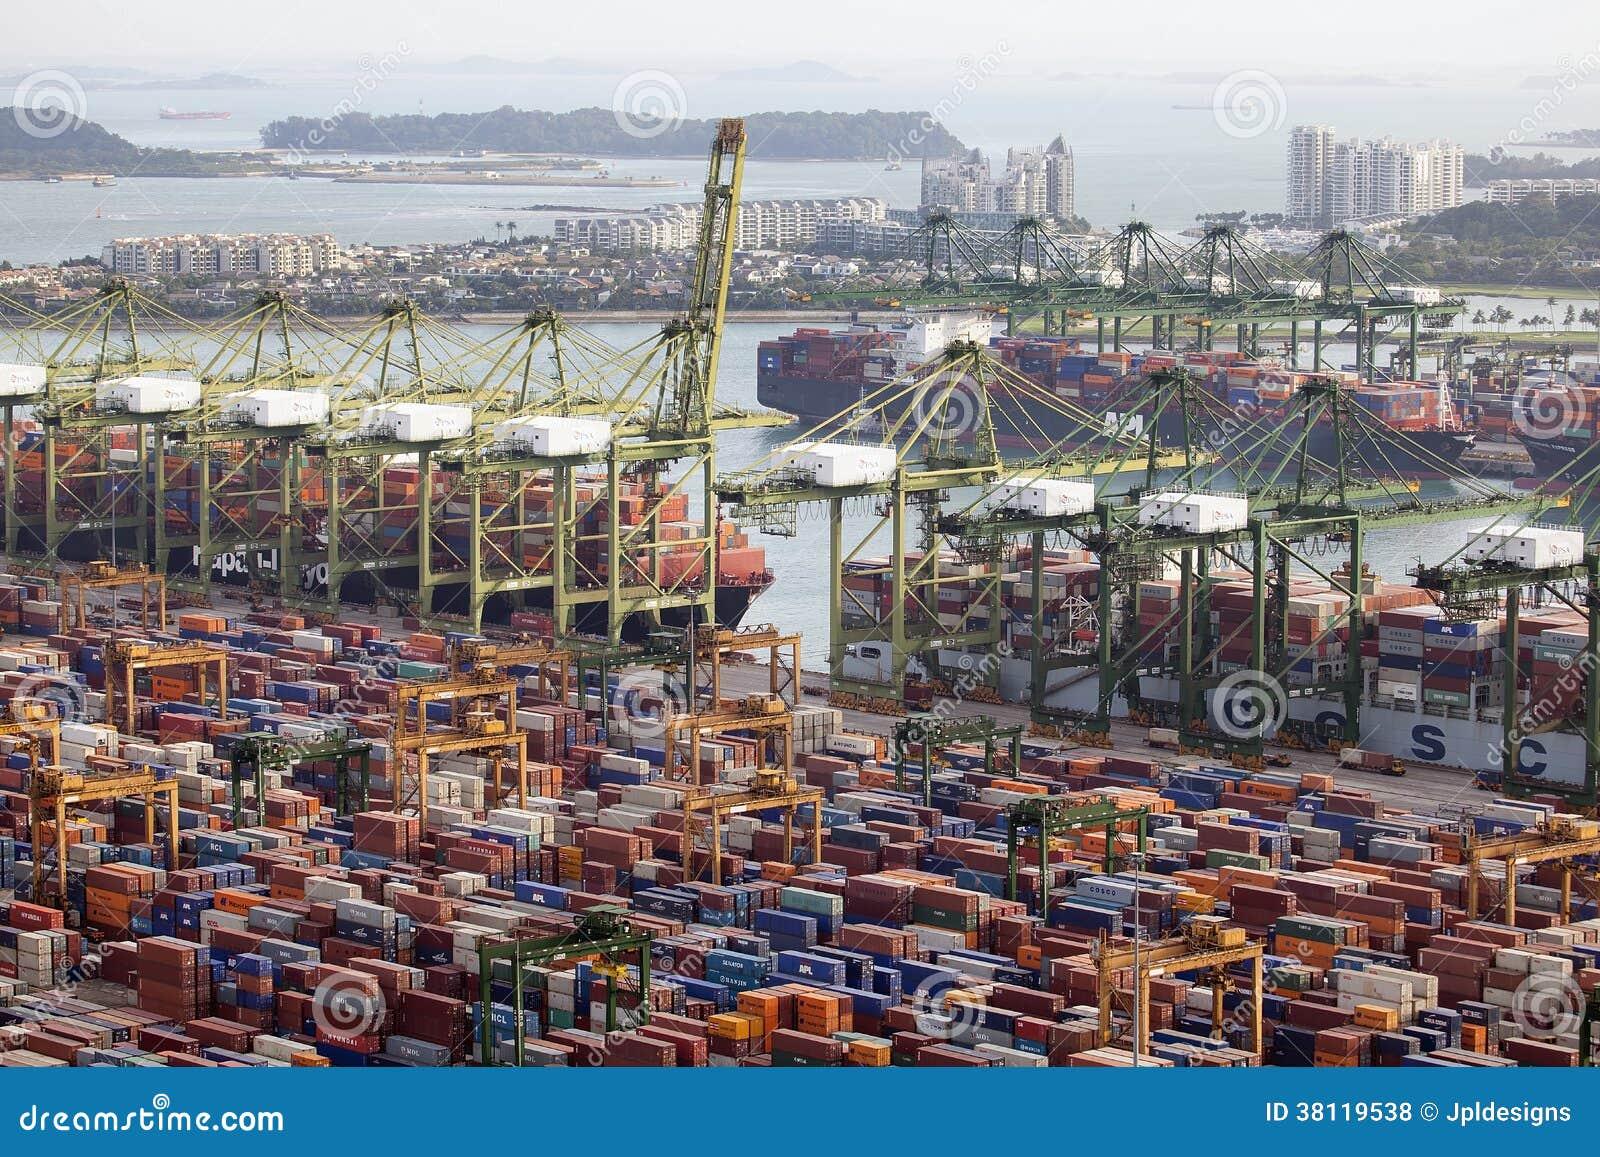 Port of Singapore Container Shipyard